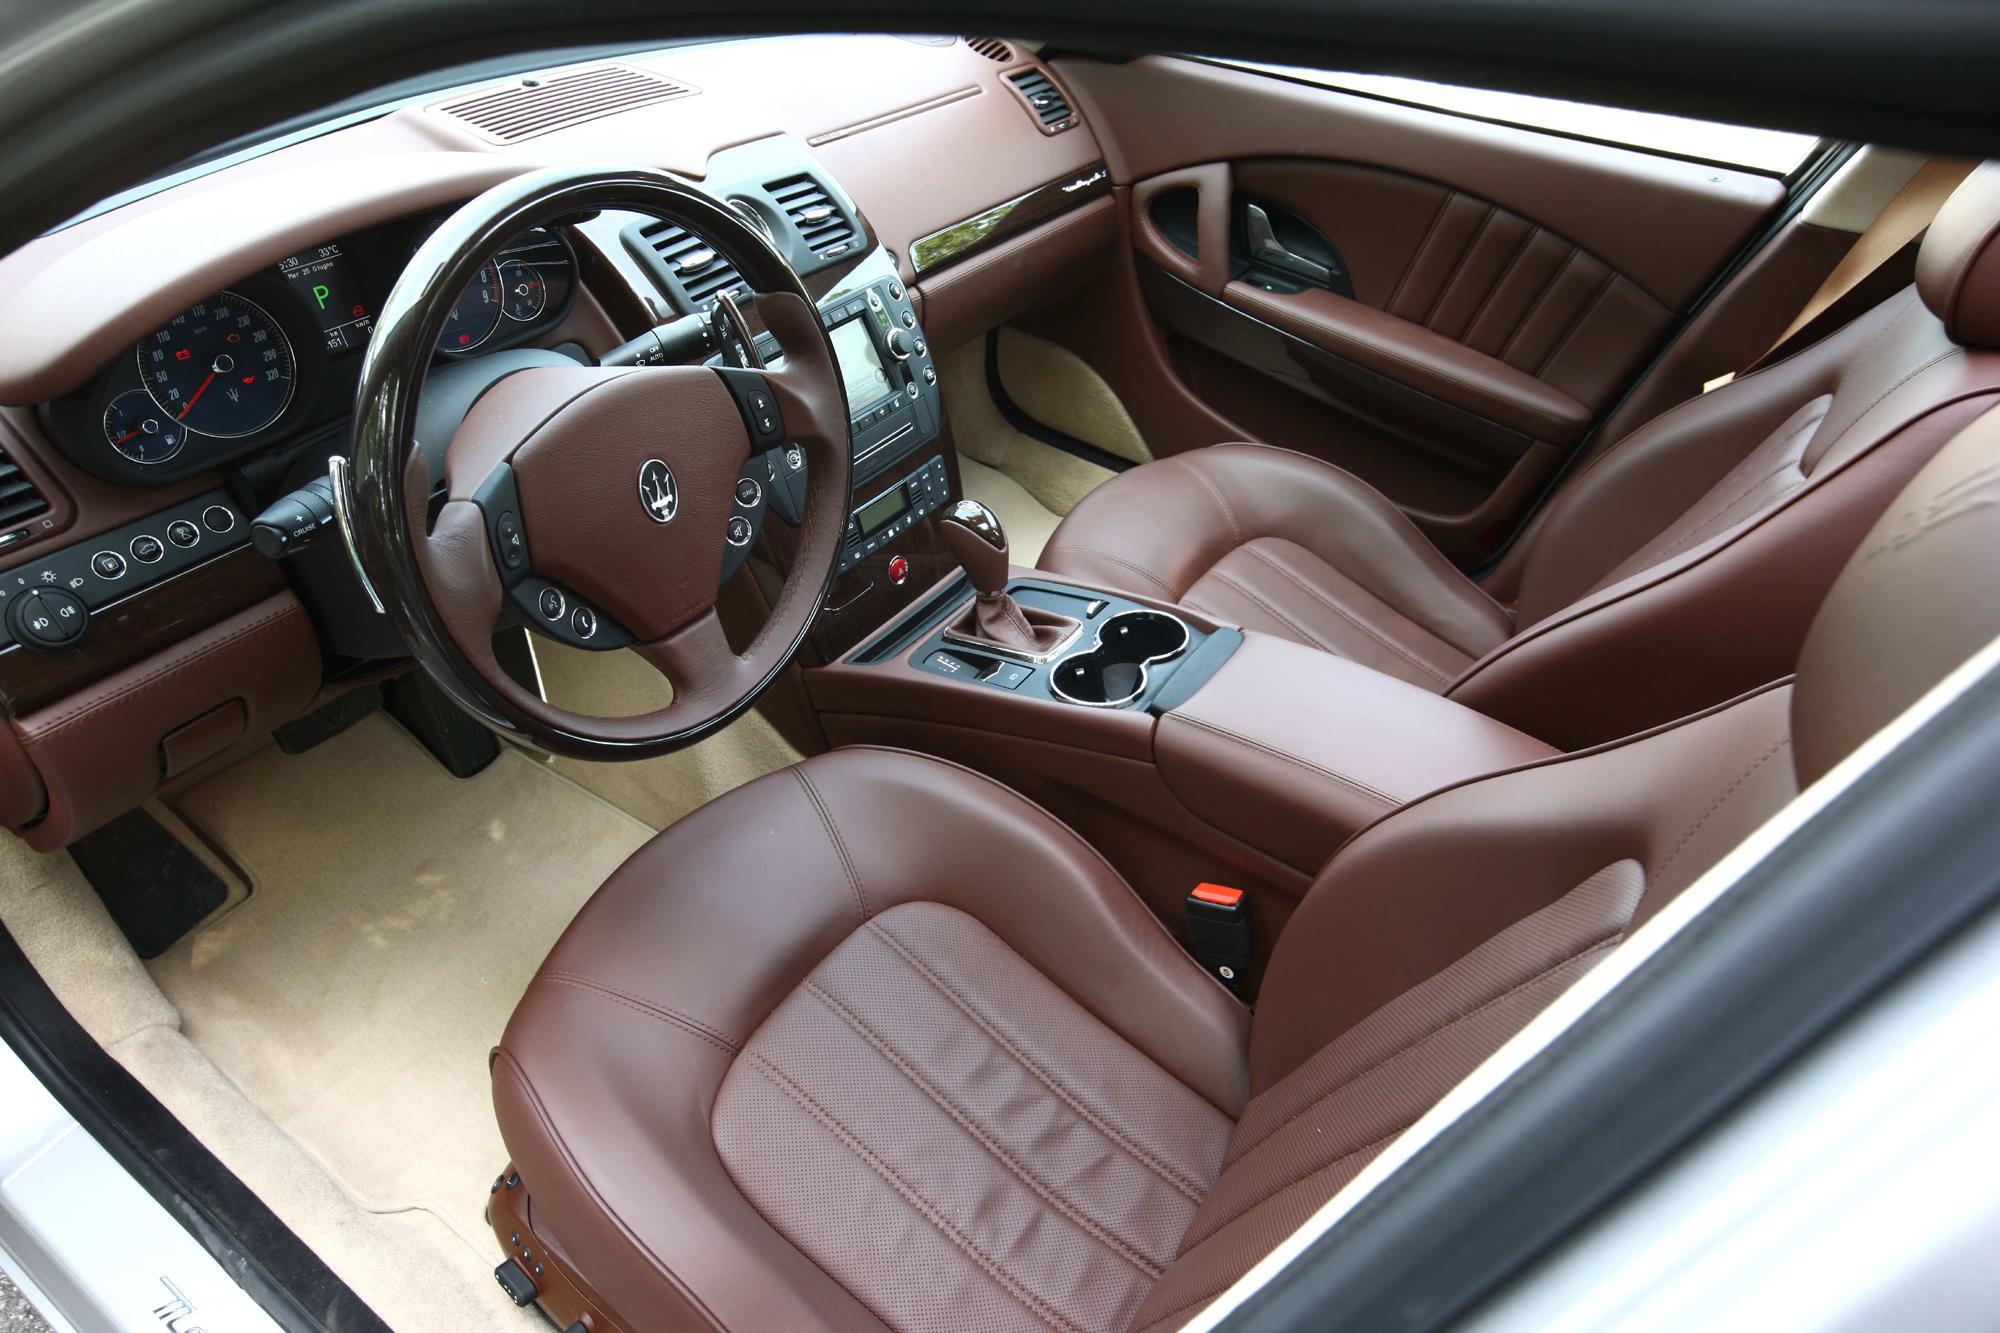 New Maserati Quattroporte Makes Its World Debut Scoop News